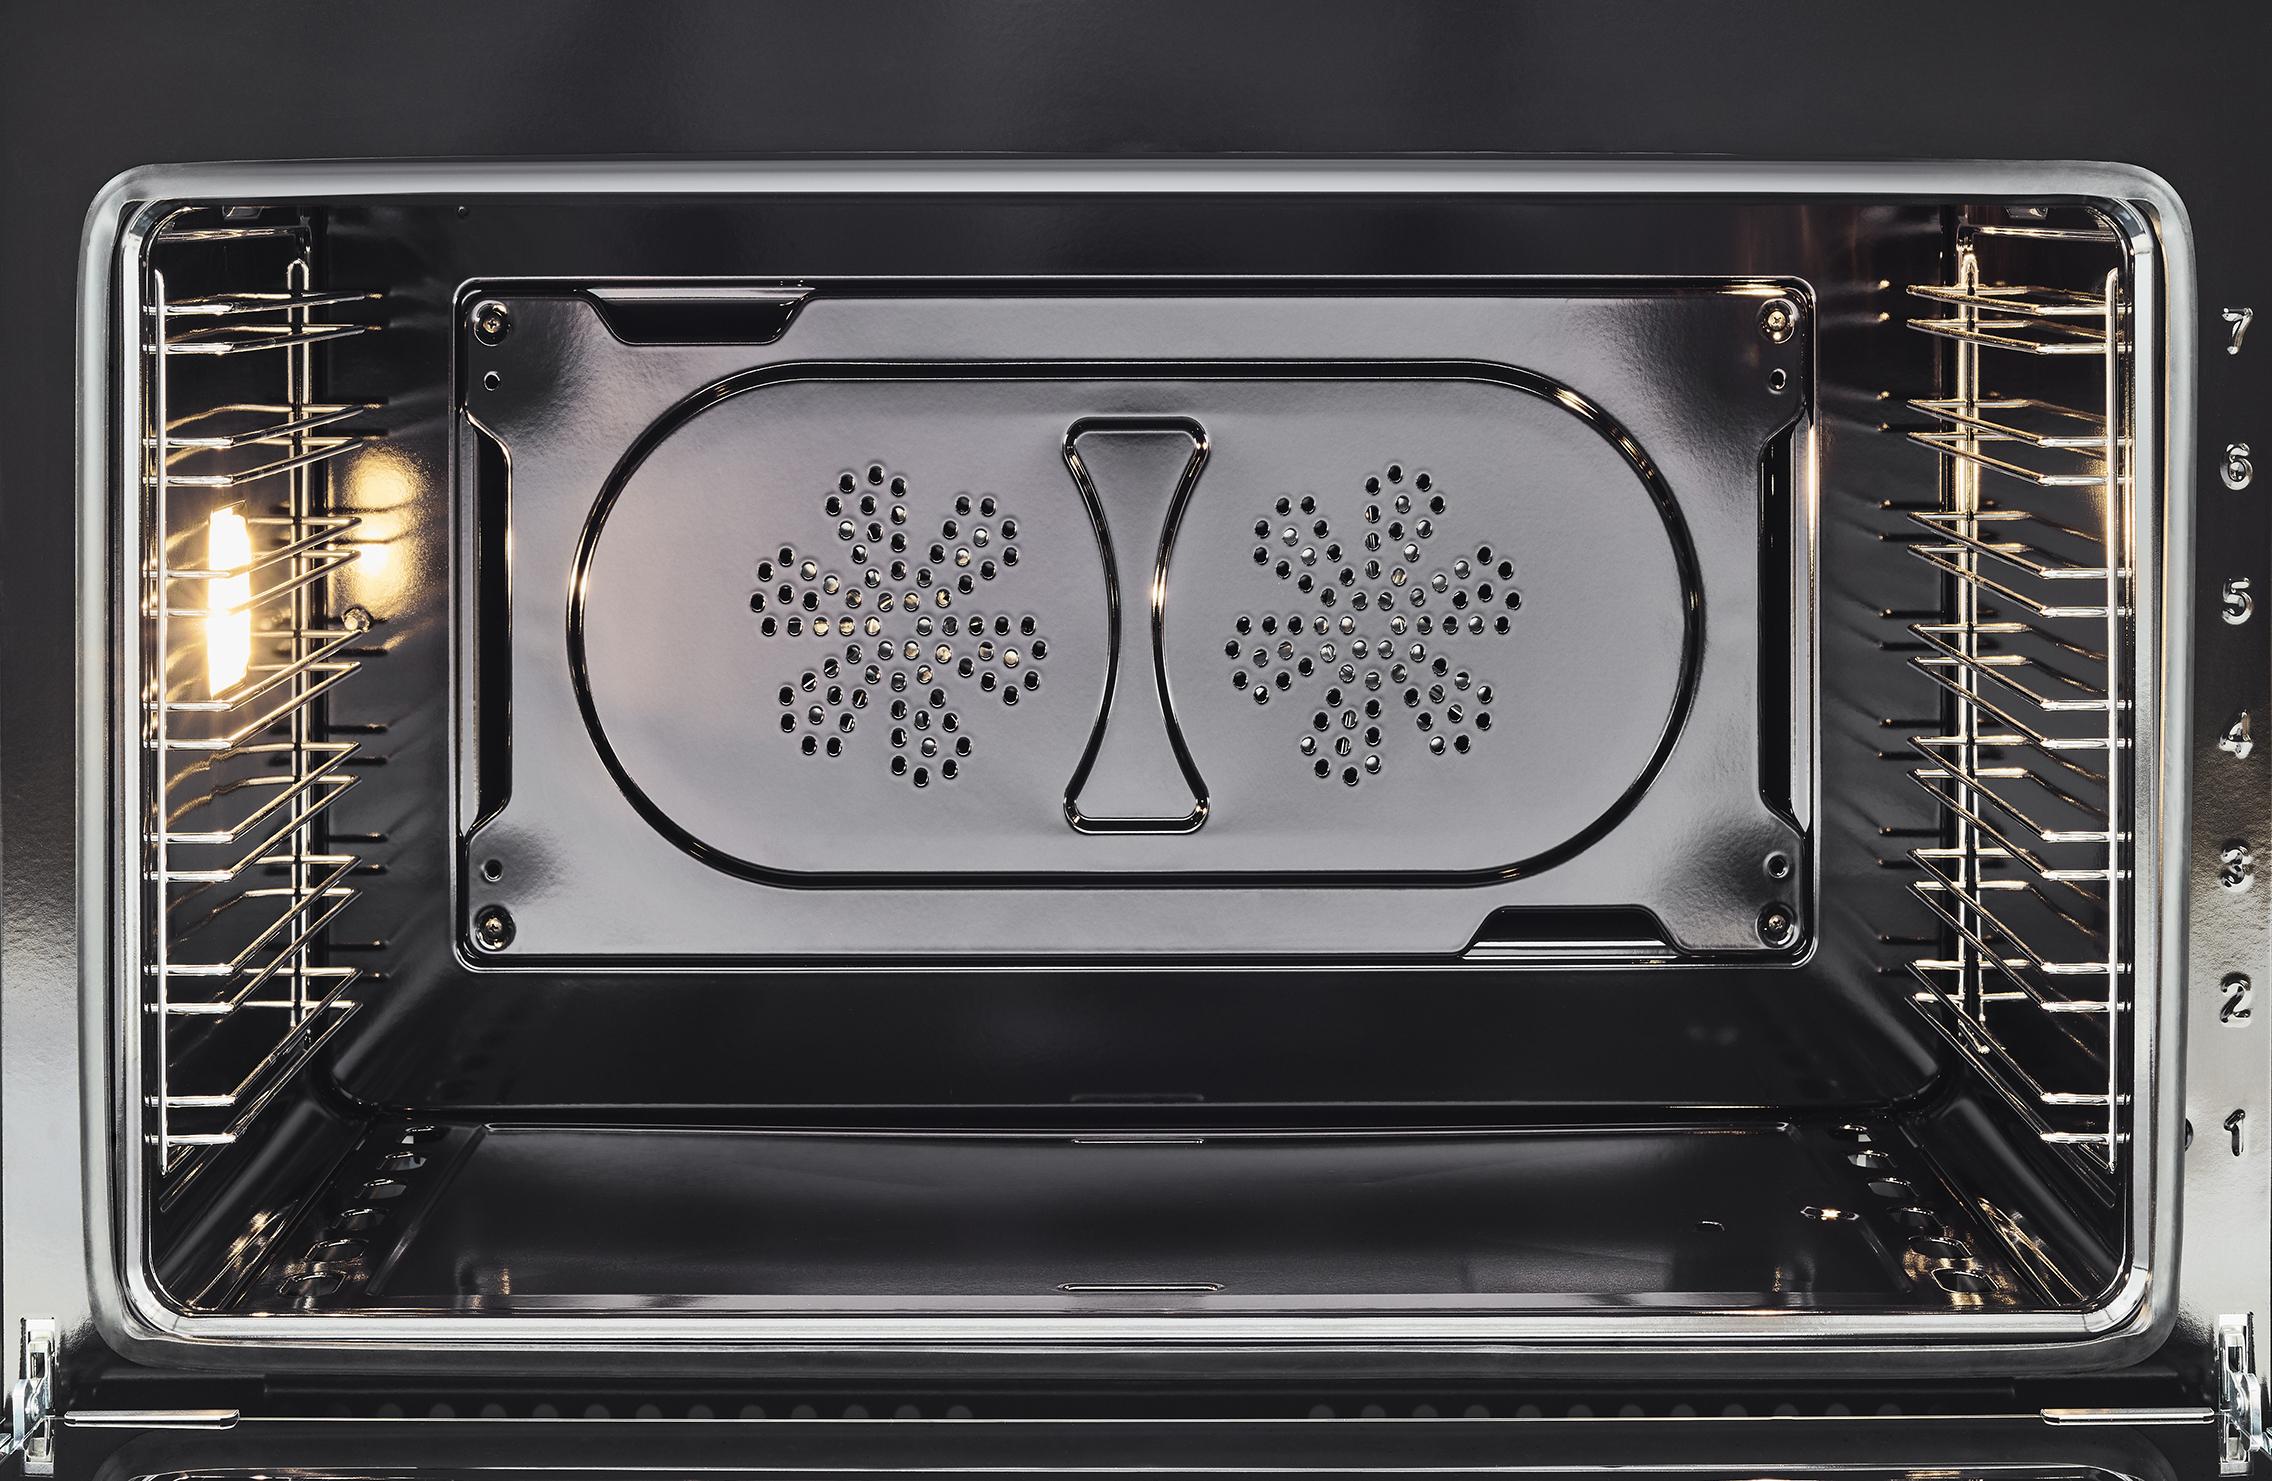 "Model: MAST365GASXE | Bertazzoni 36"" Master Series range - Gas oven - 5 aluminum burners"